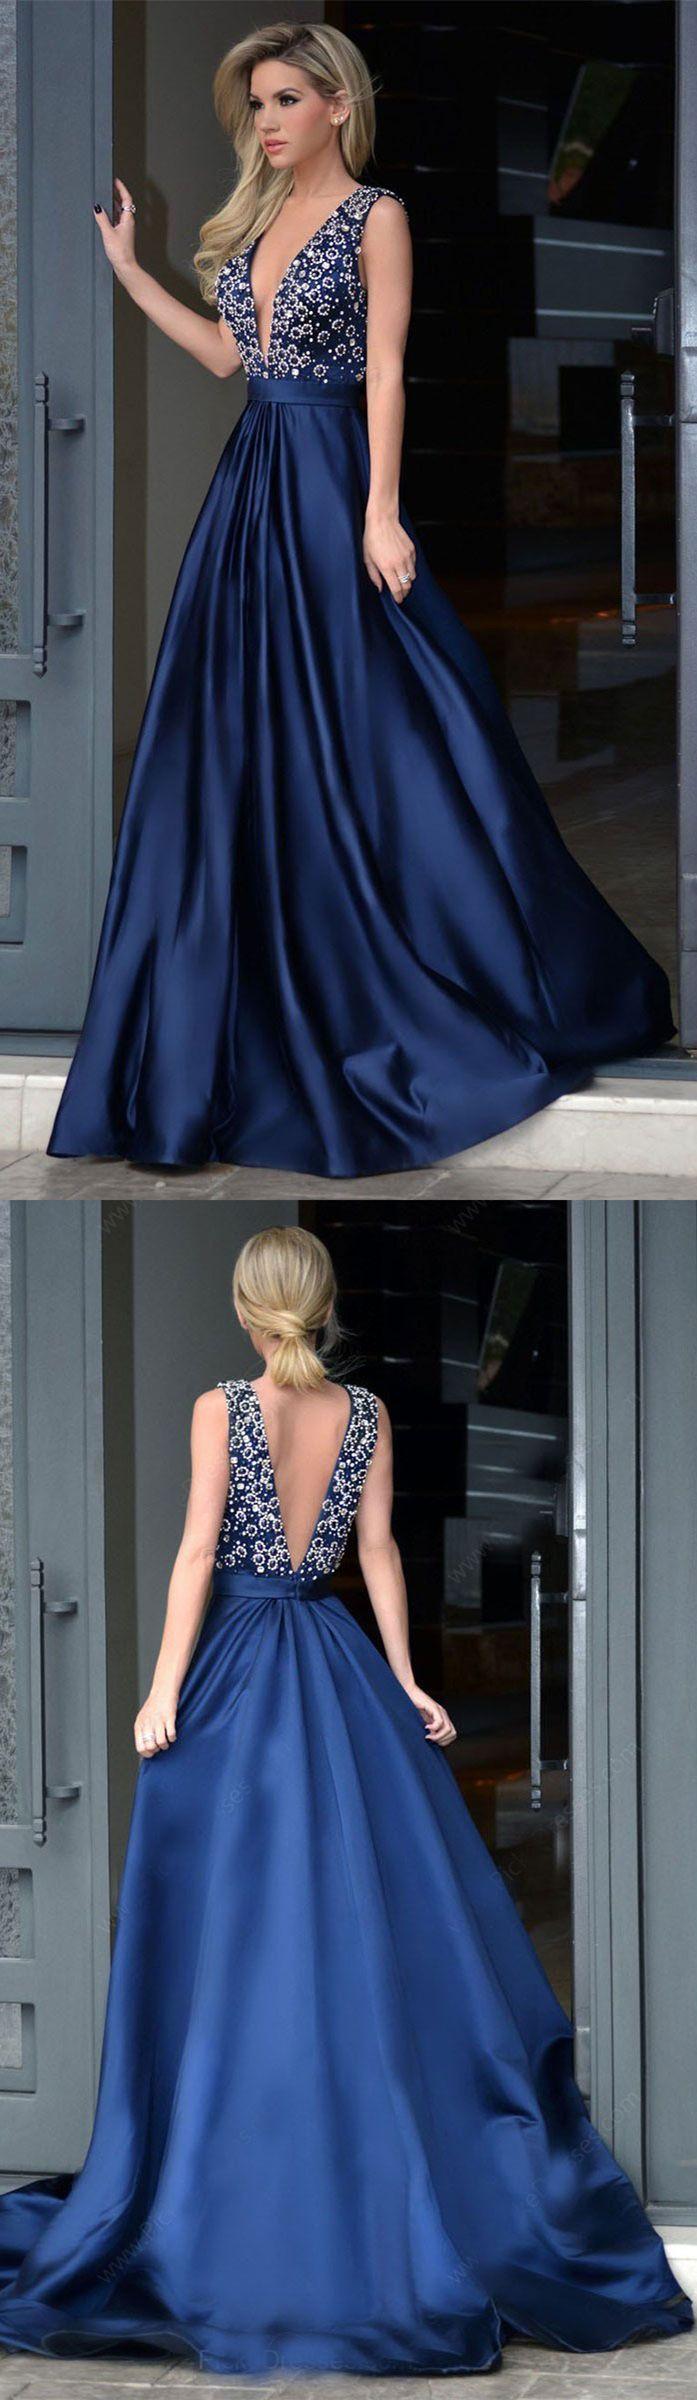 Aline vneck beaded bodice navy satin long prom dresses apd